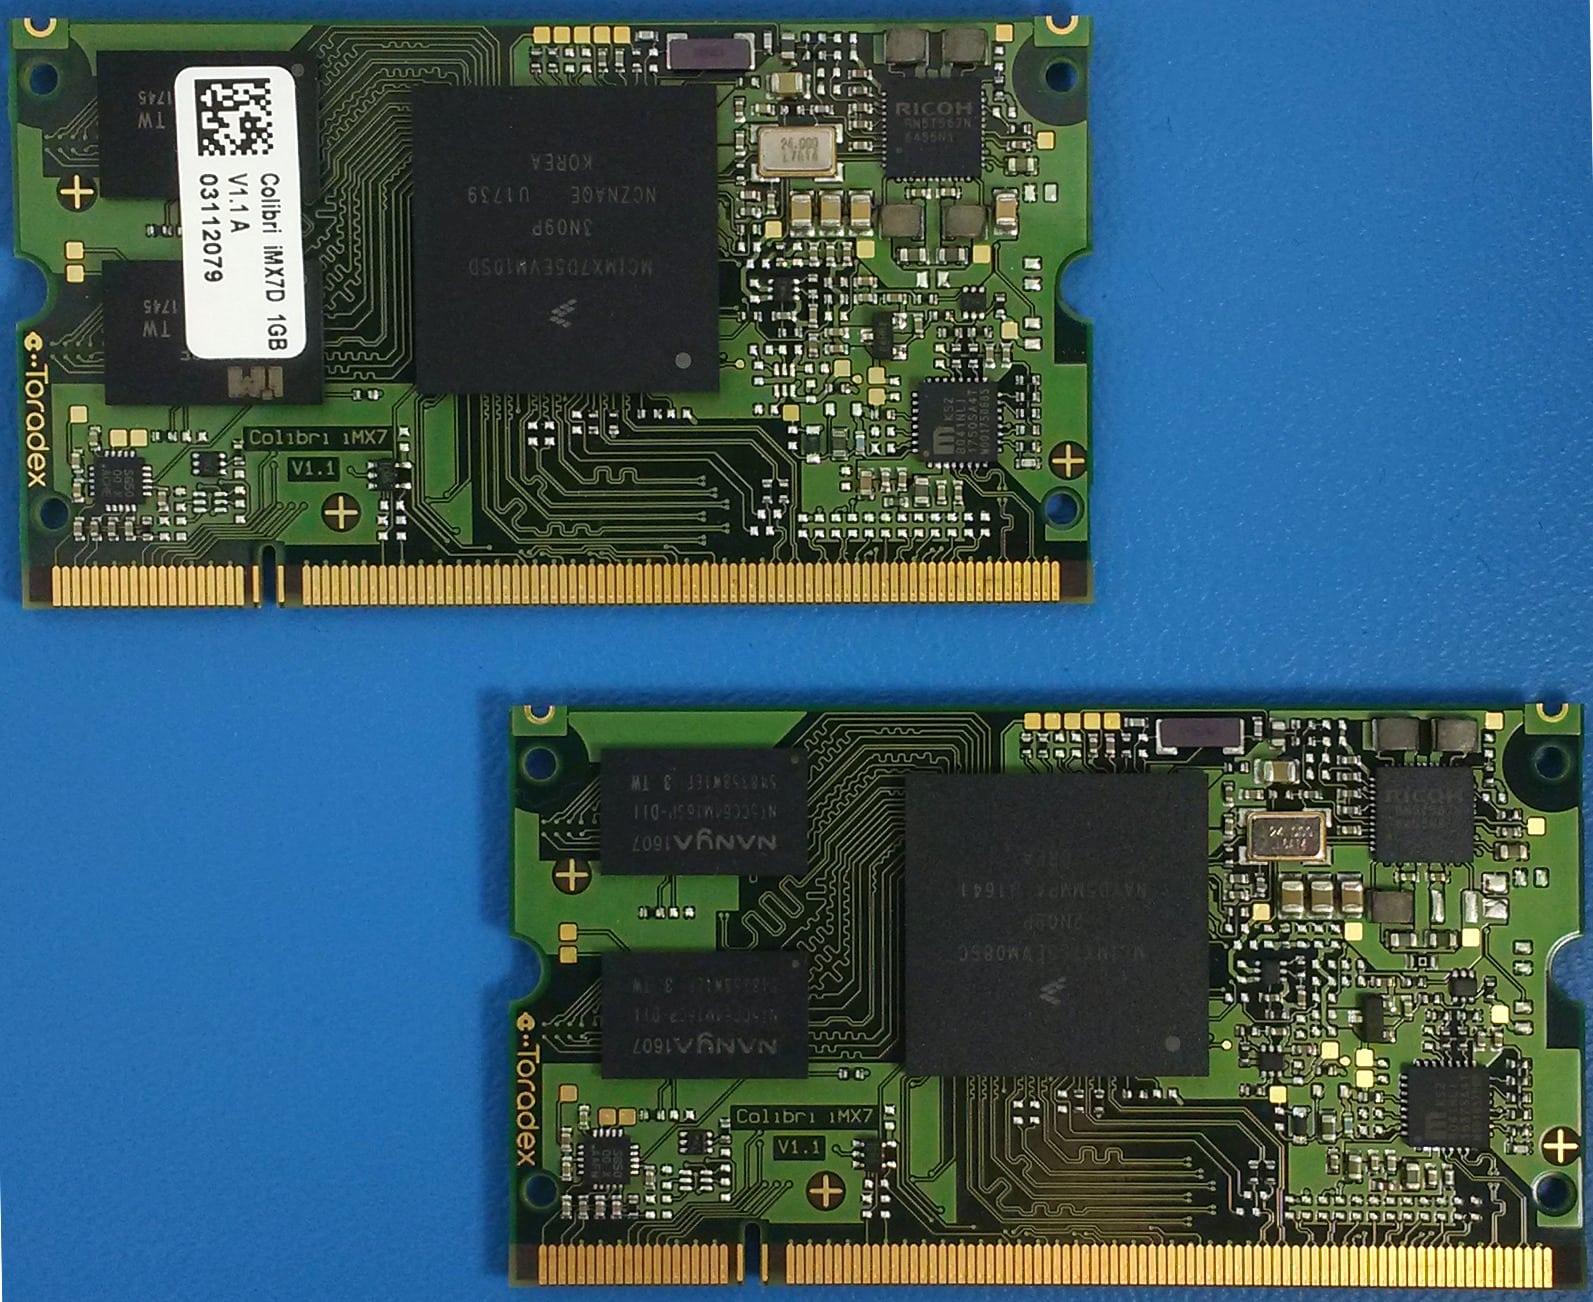 Toradex Colibri iMX7 System on Modules.